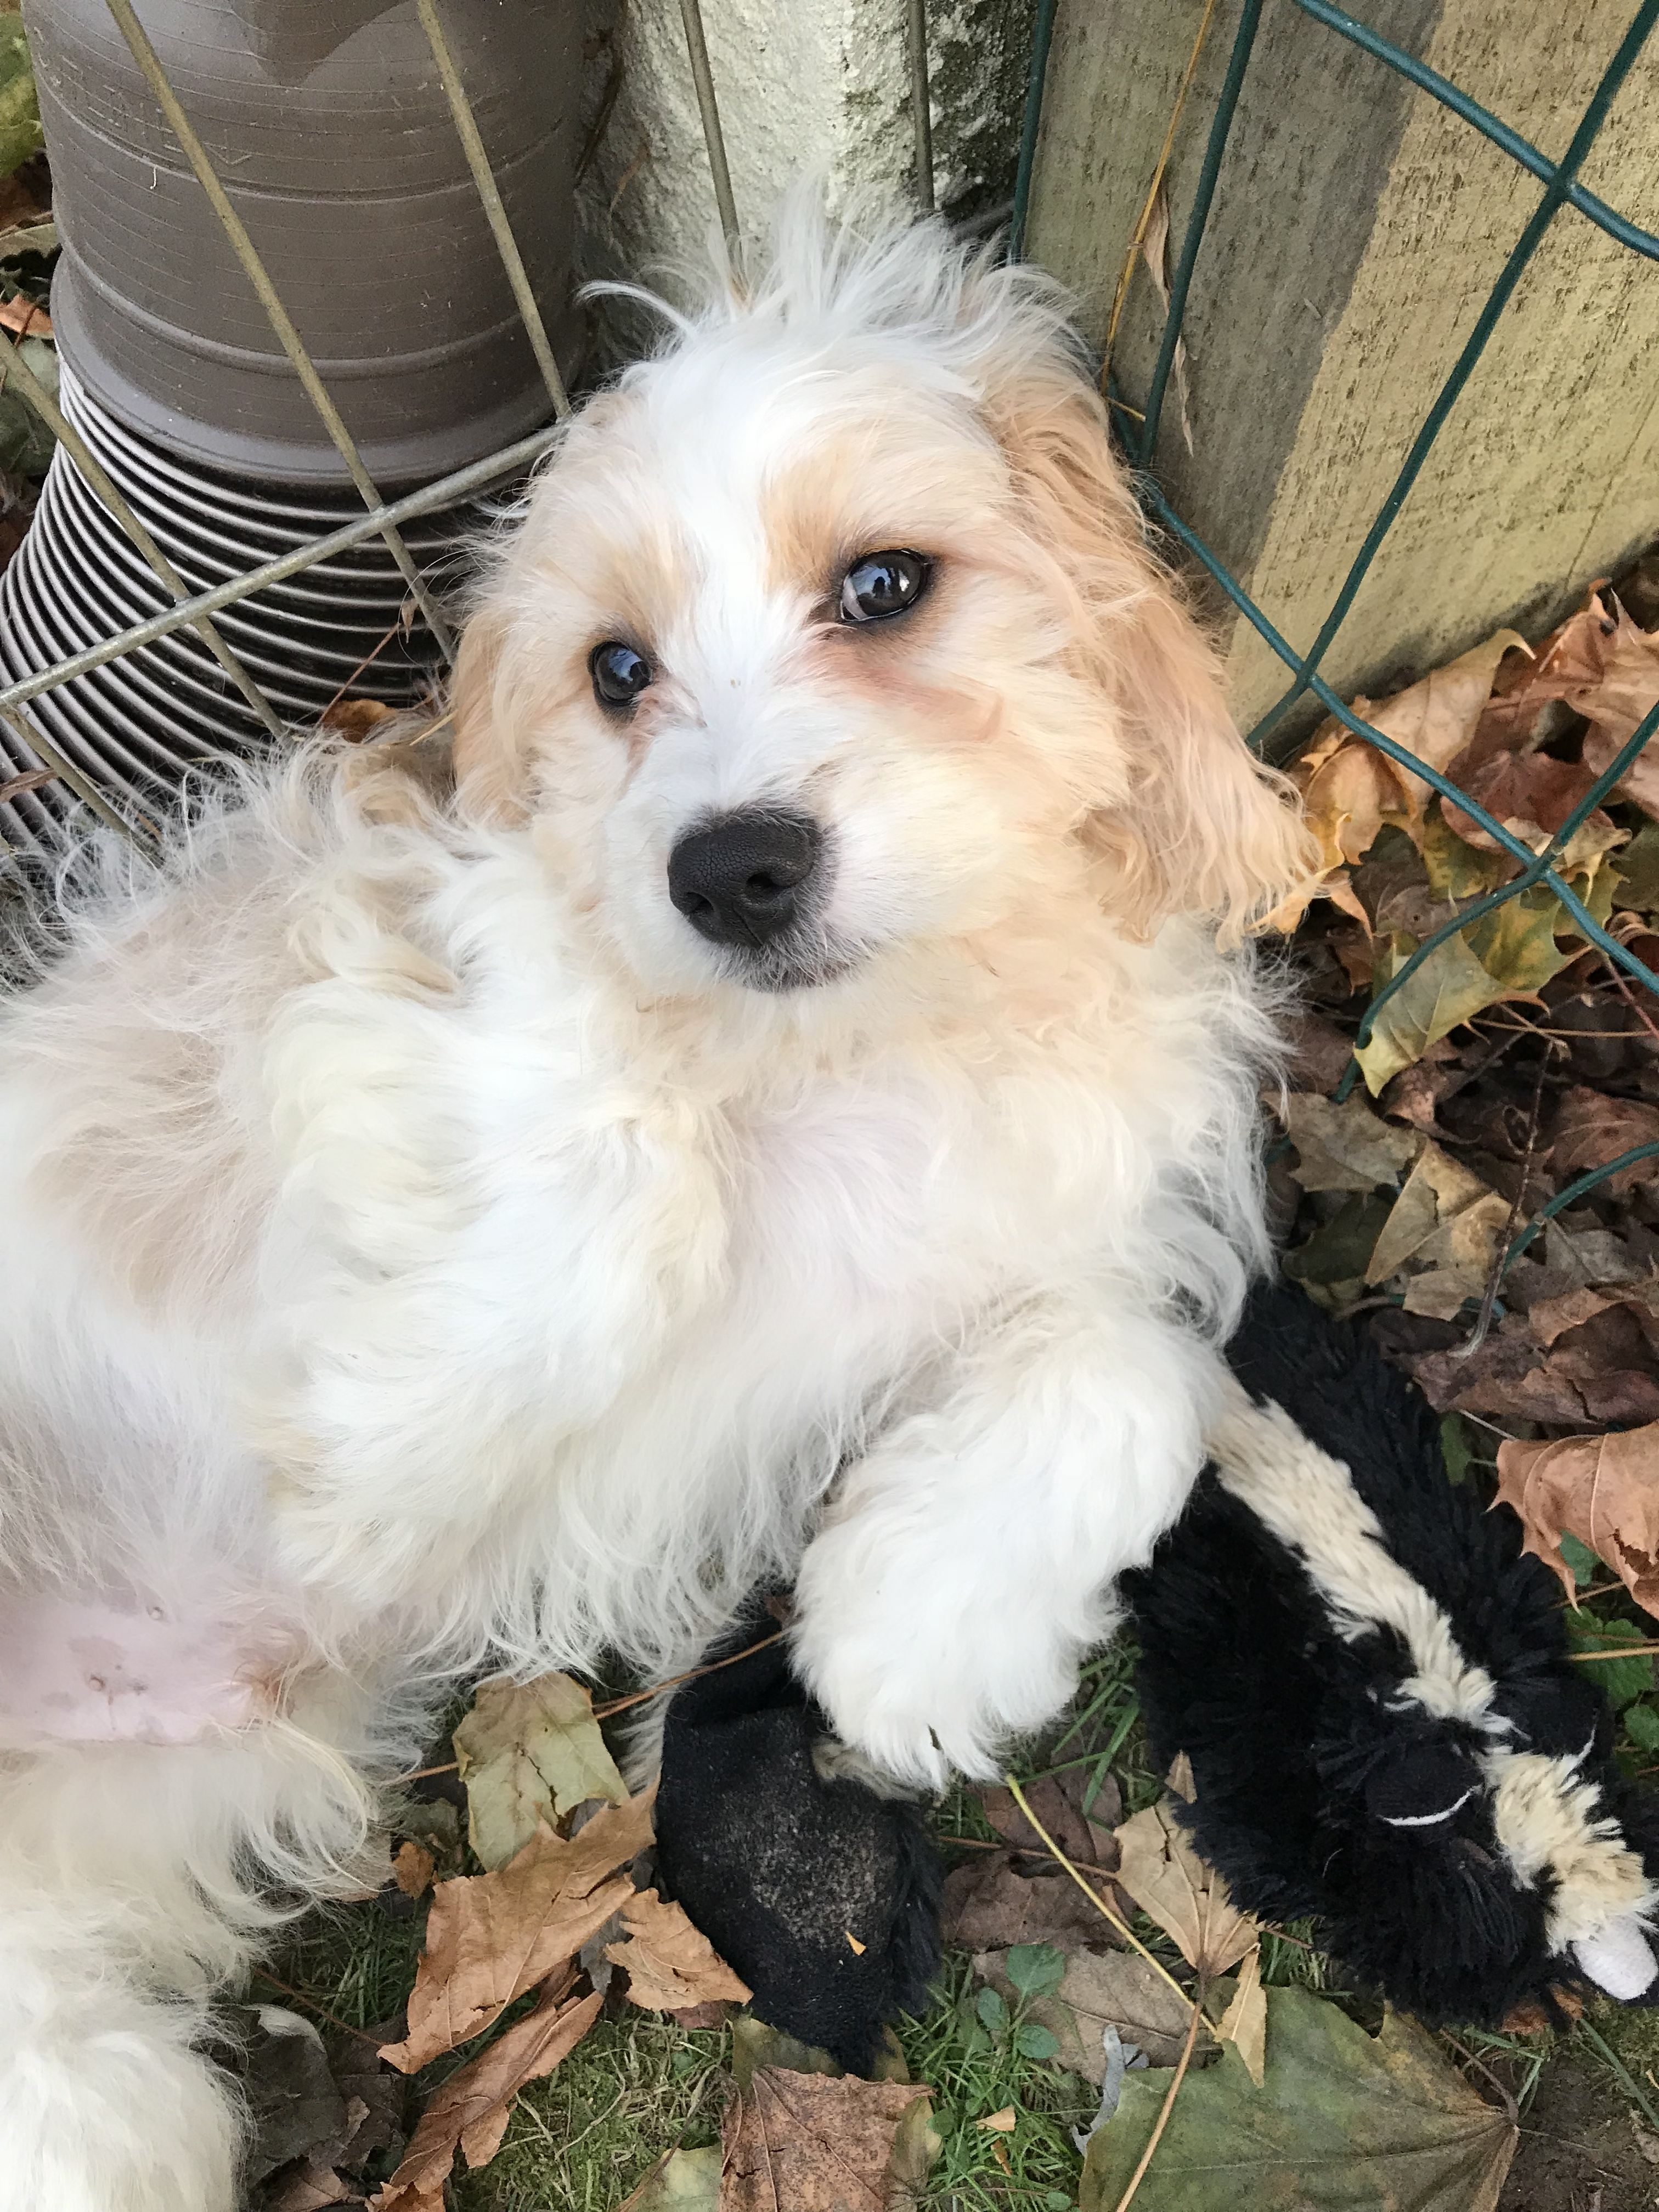 Cavachon dog for Adoption in Landenberg, PA. ADN733500 on